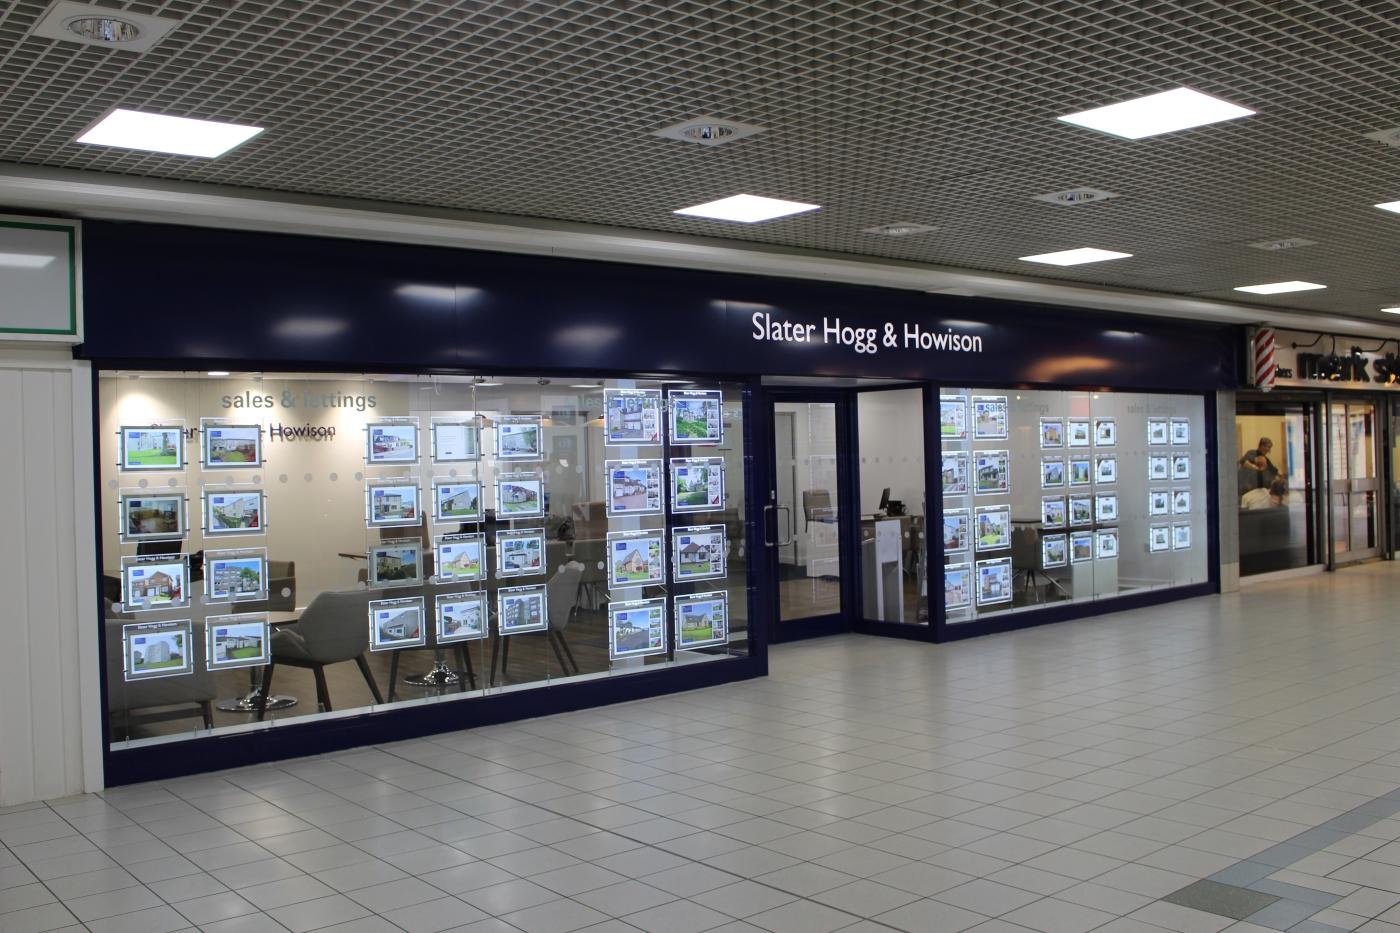 Slater Hogg & Howison Estate Agents Cumbernauld